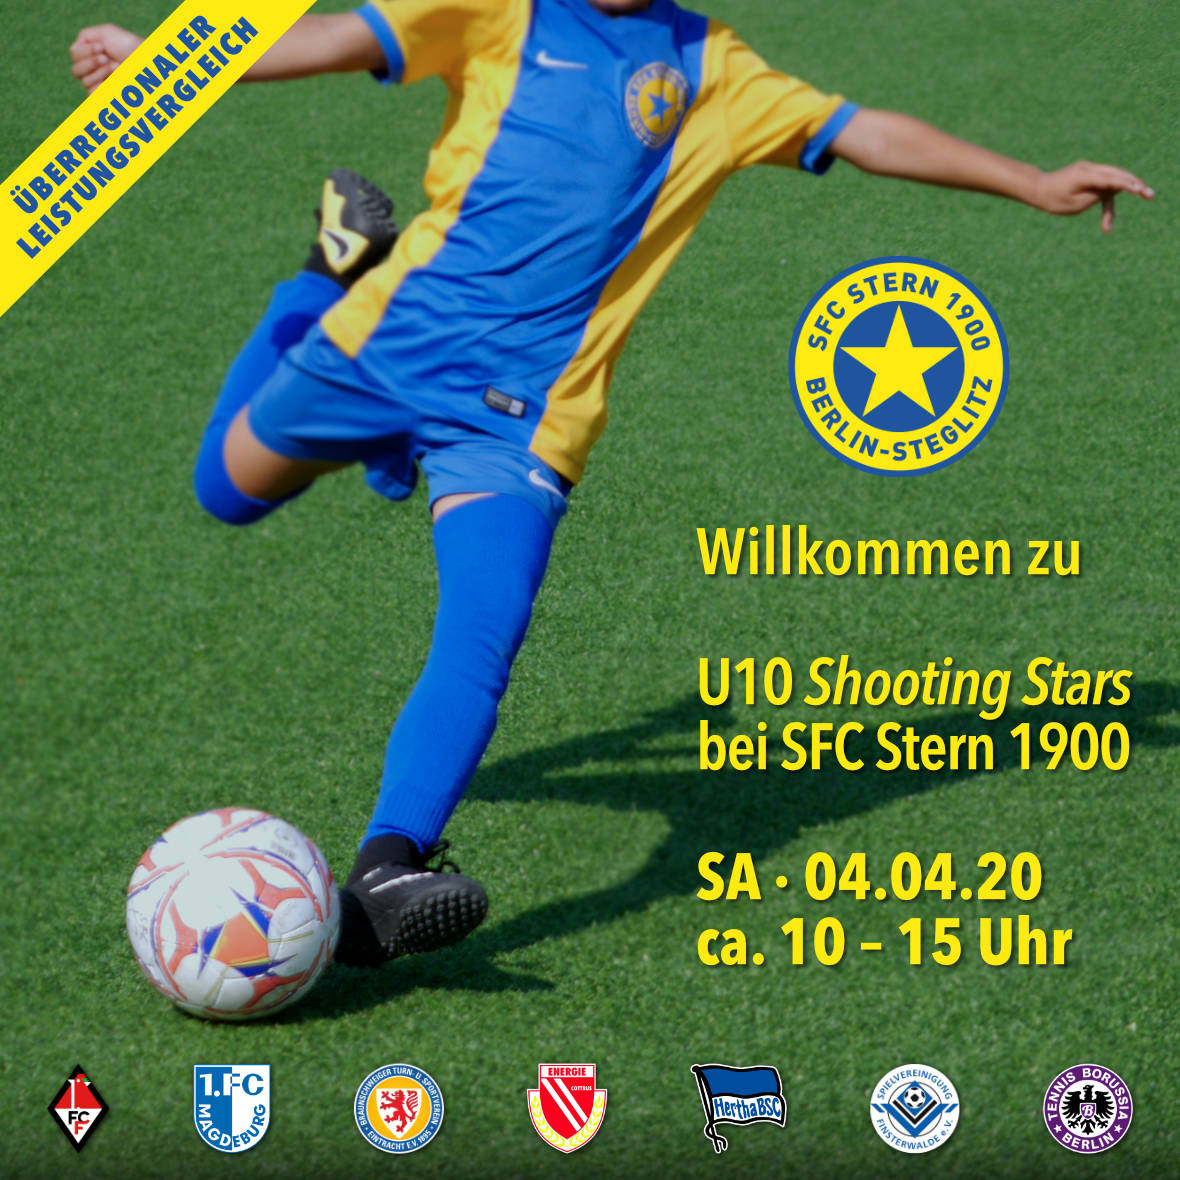 Willkommen zu U10 Shooting Stars am 04.04.2020 bei SFC Stern 1900 Berlin